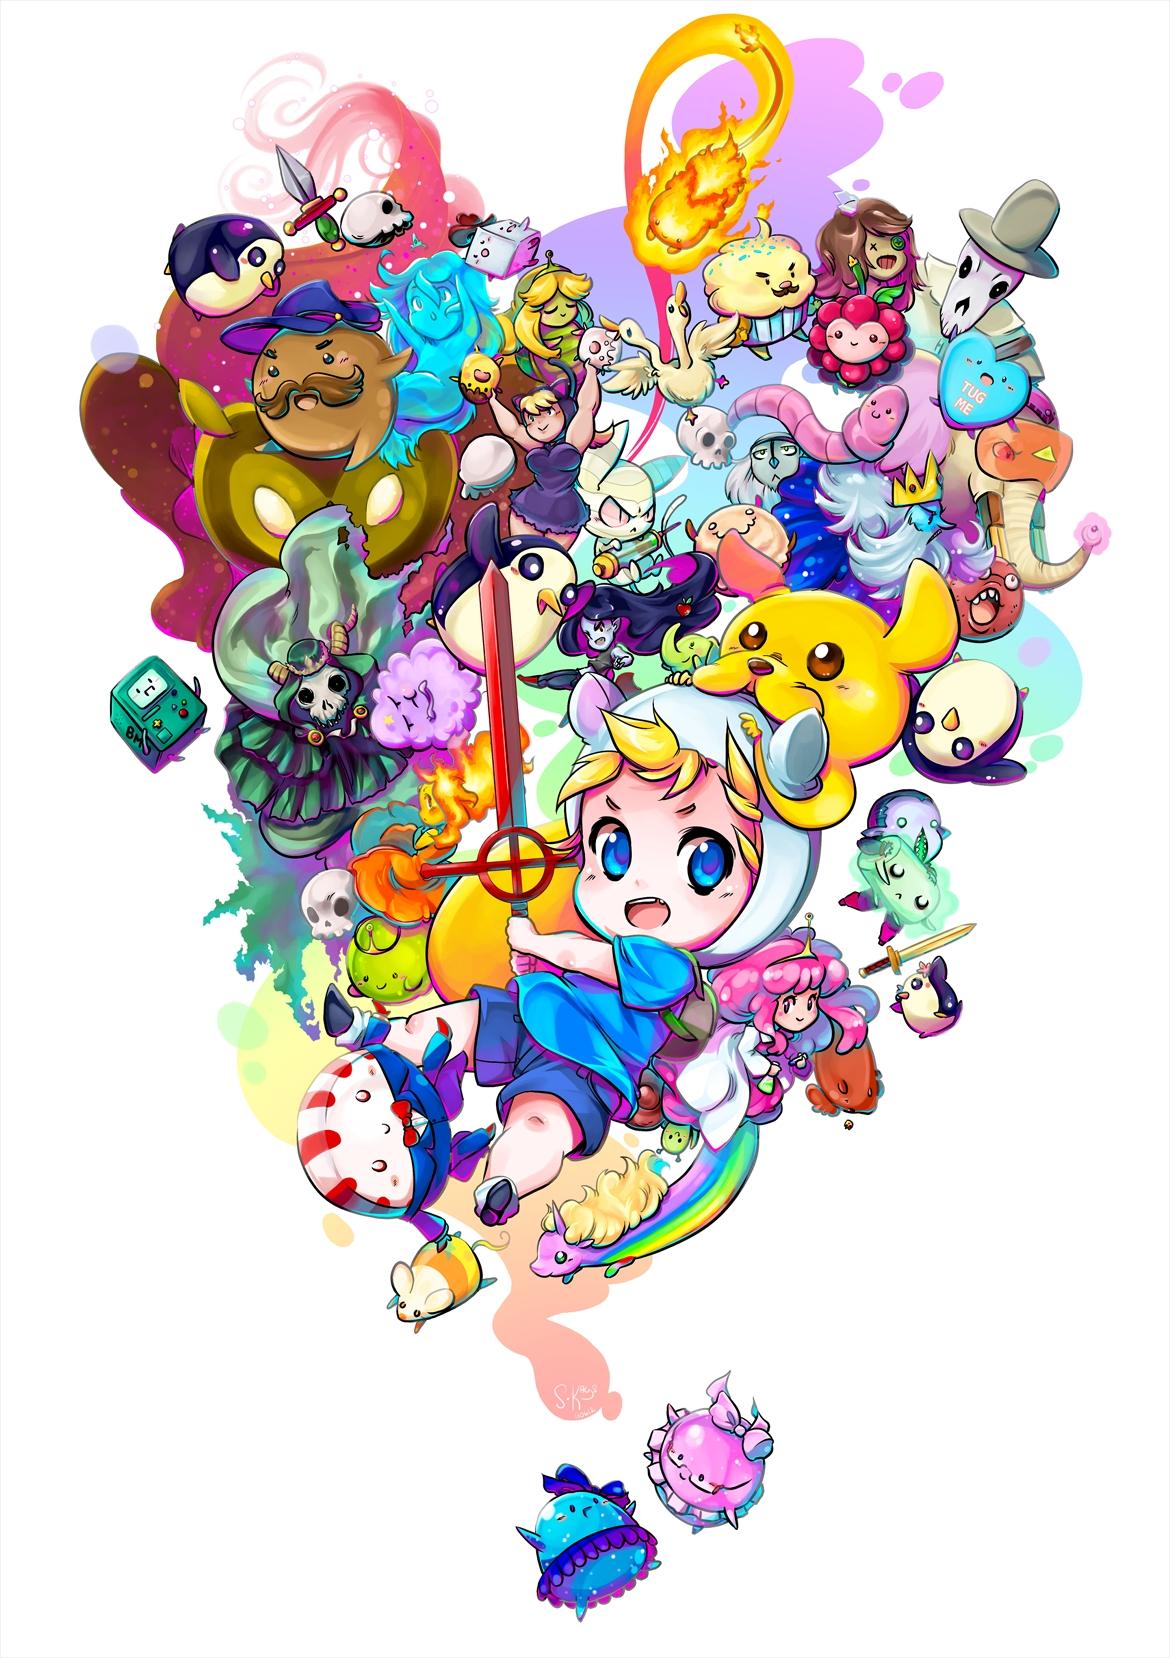 Lady Rainicorn Adventure Time Zerochan Anime Image Board